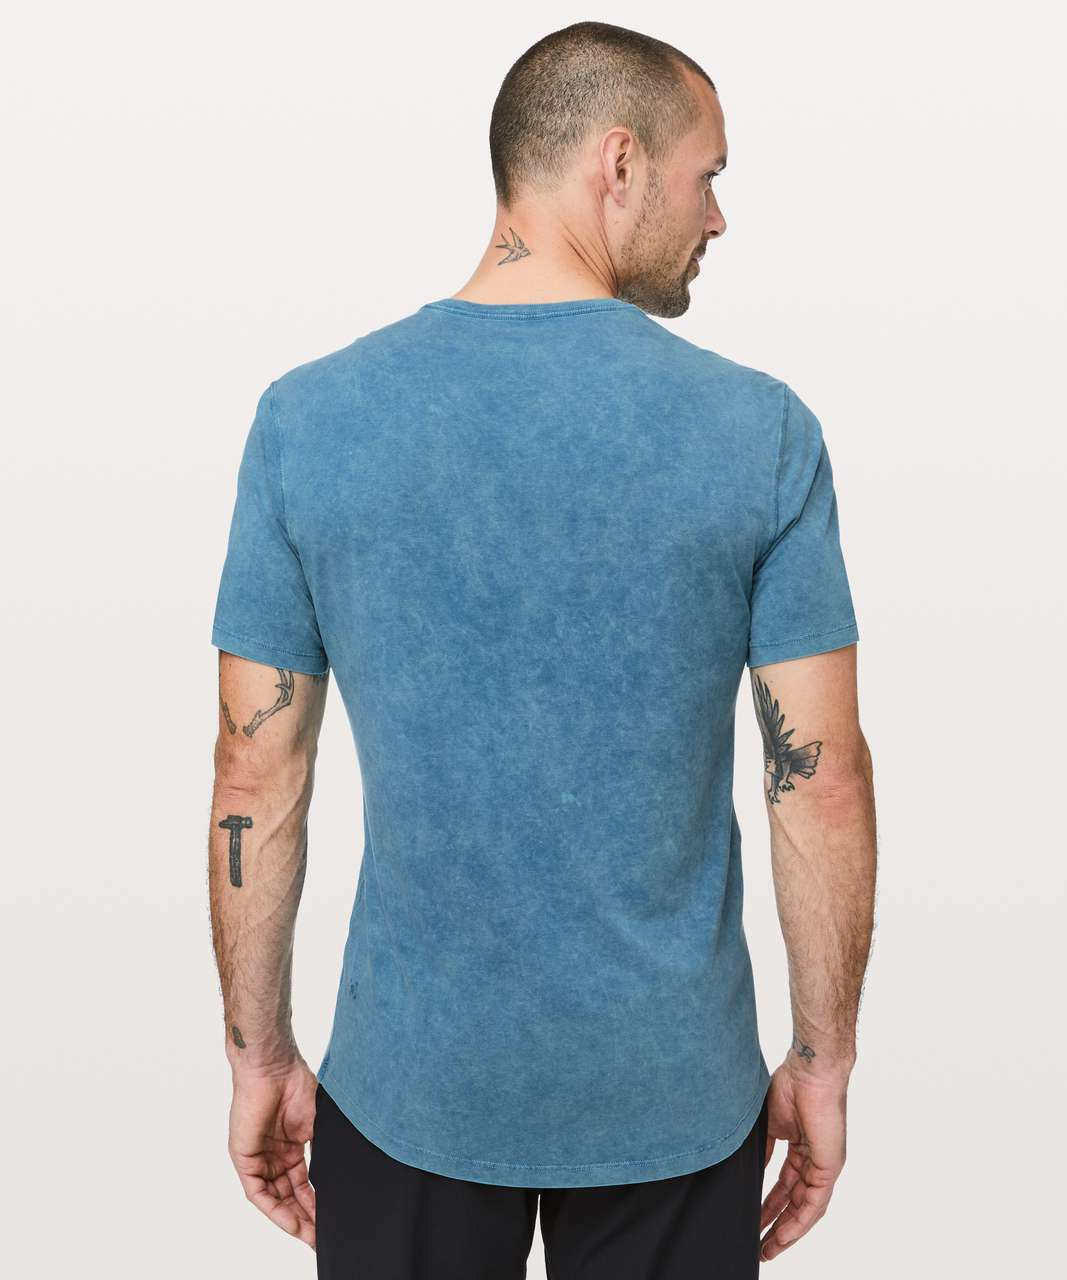 Lululemon 5 Year Basic V *Mineral Wash - Mineral Washed Pewter Blue